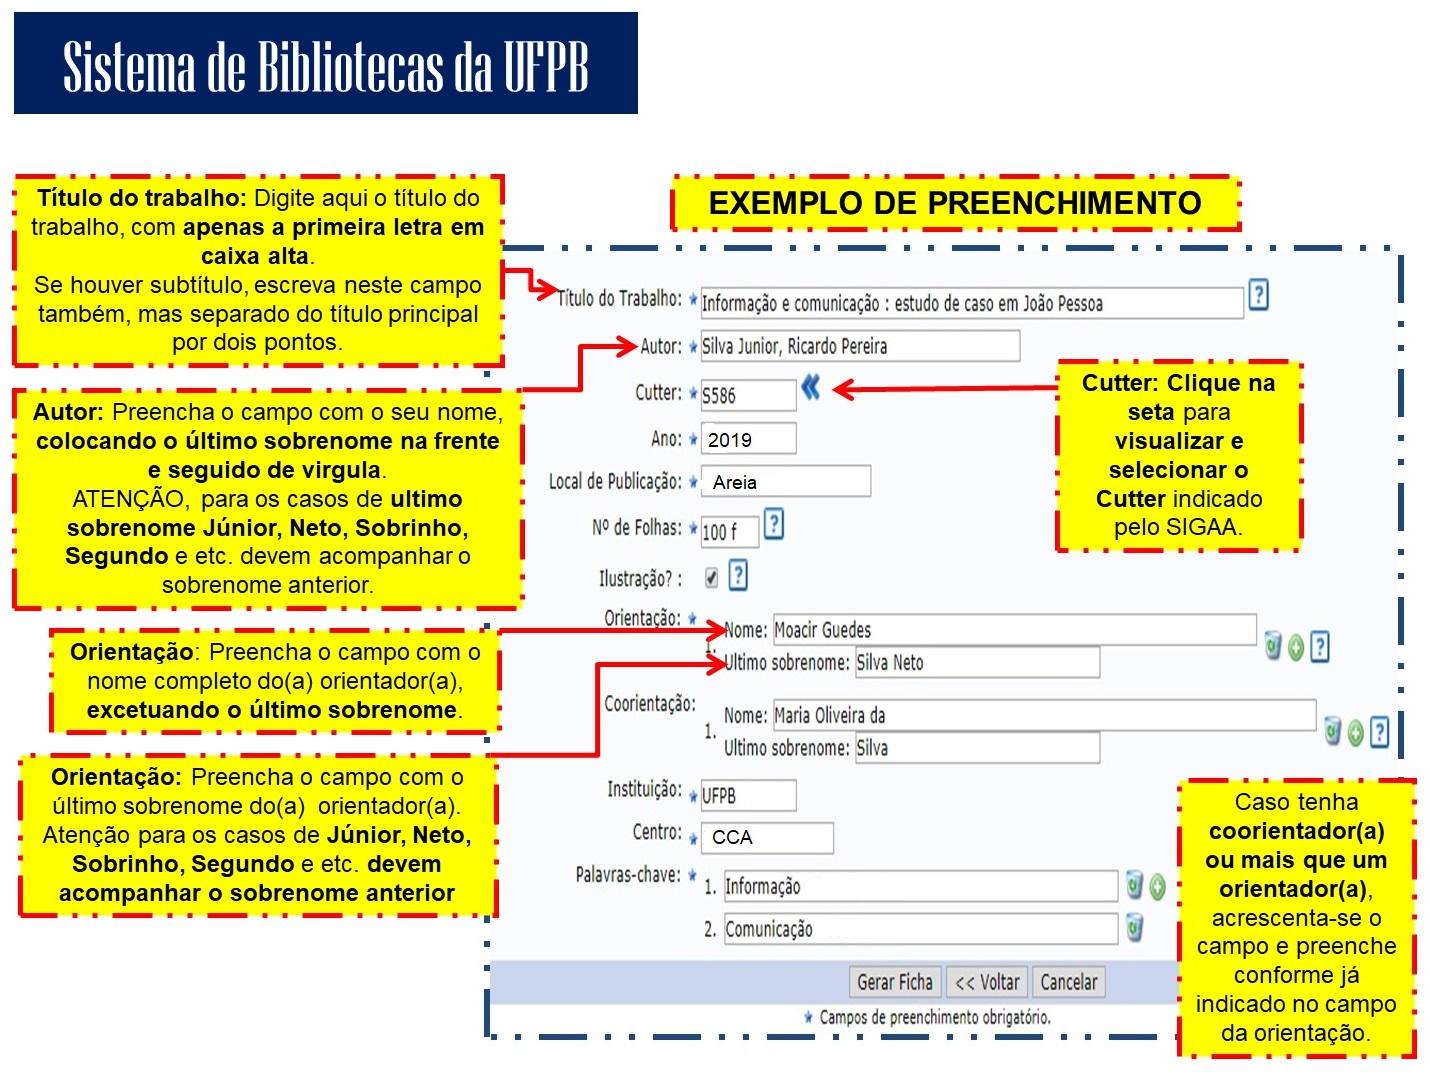 Modelo de Preenchimento Ficha Catalográfica